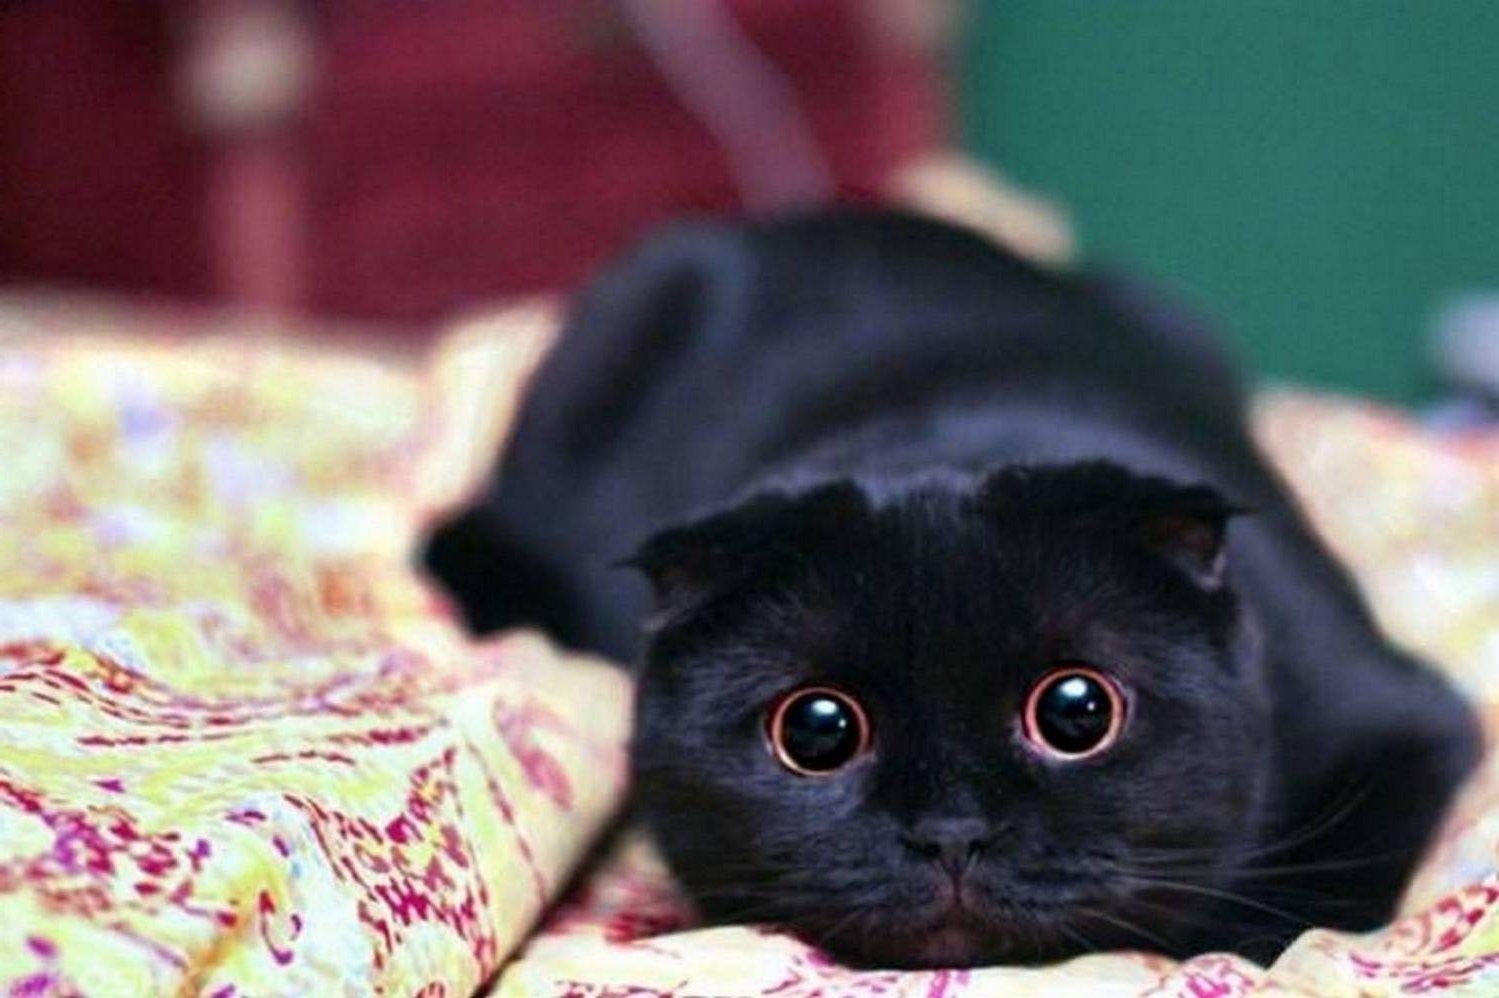 Сон укусил чёрный кот